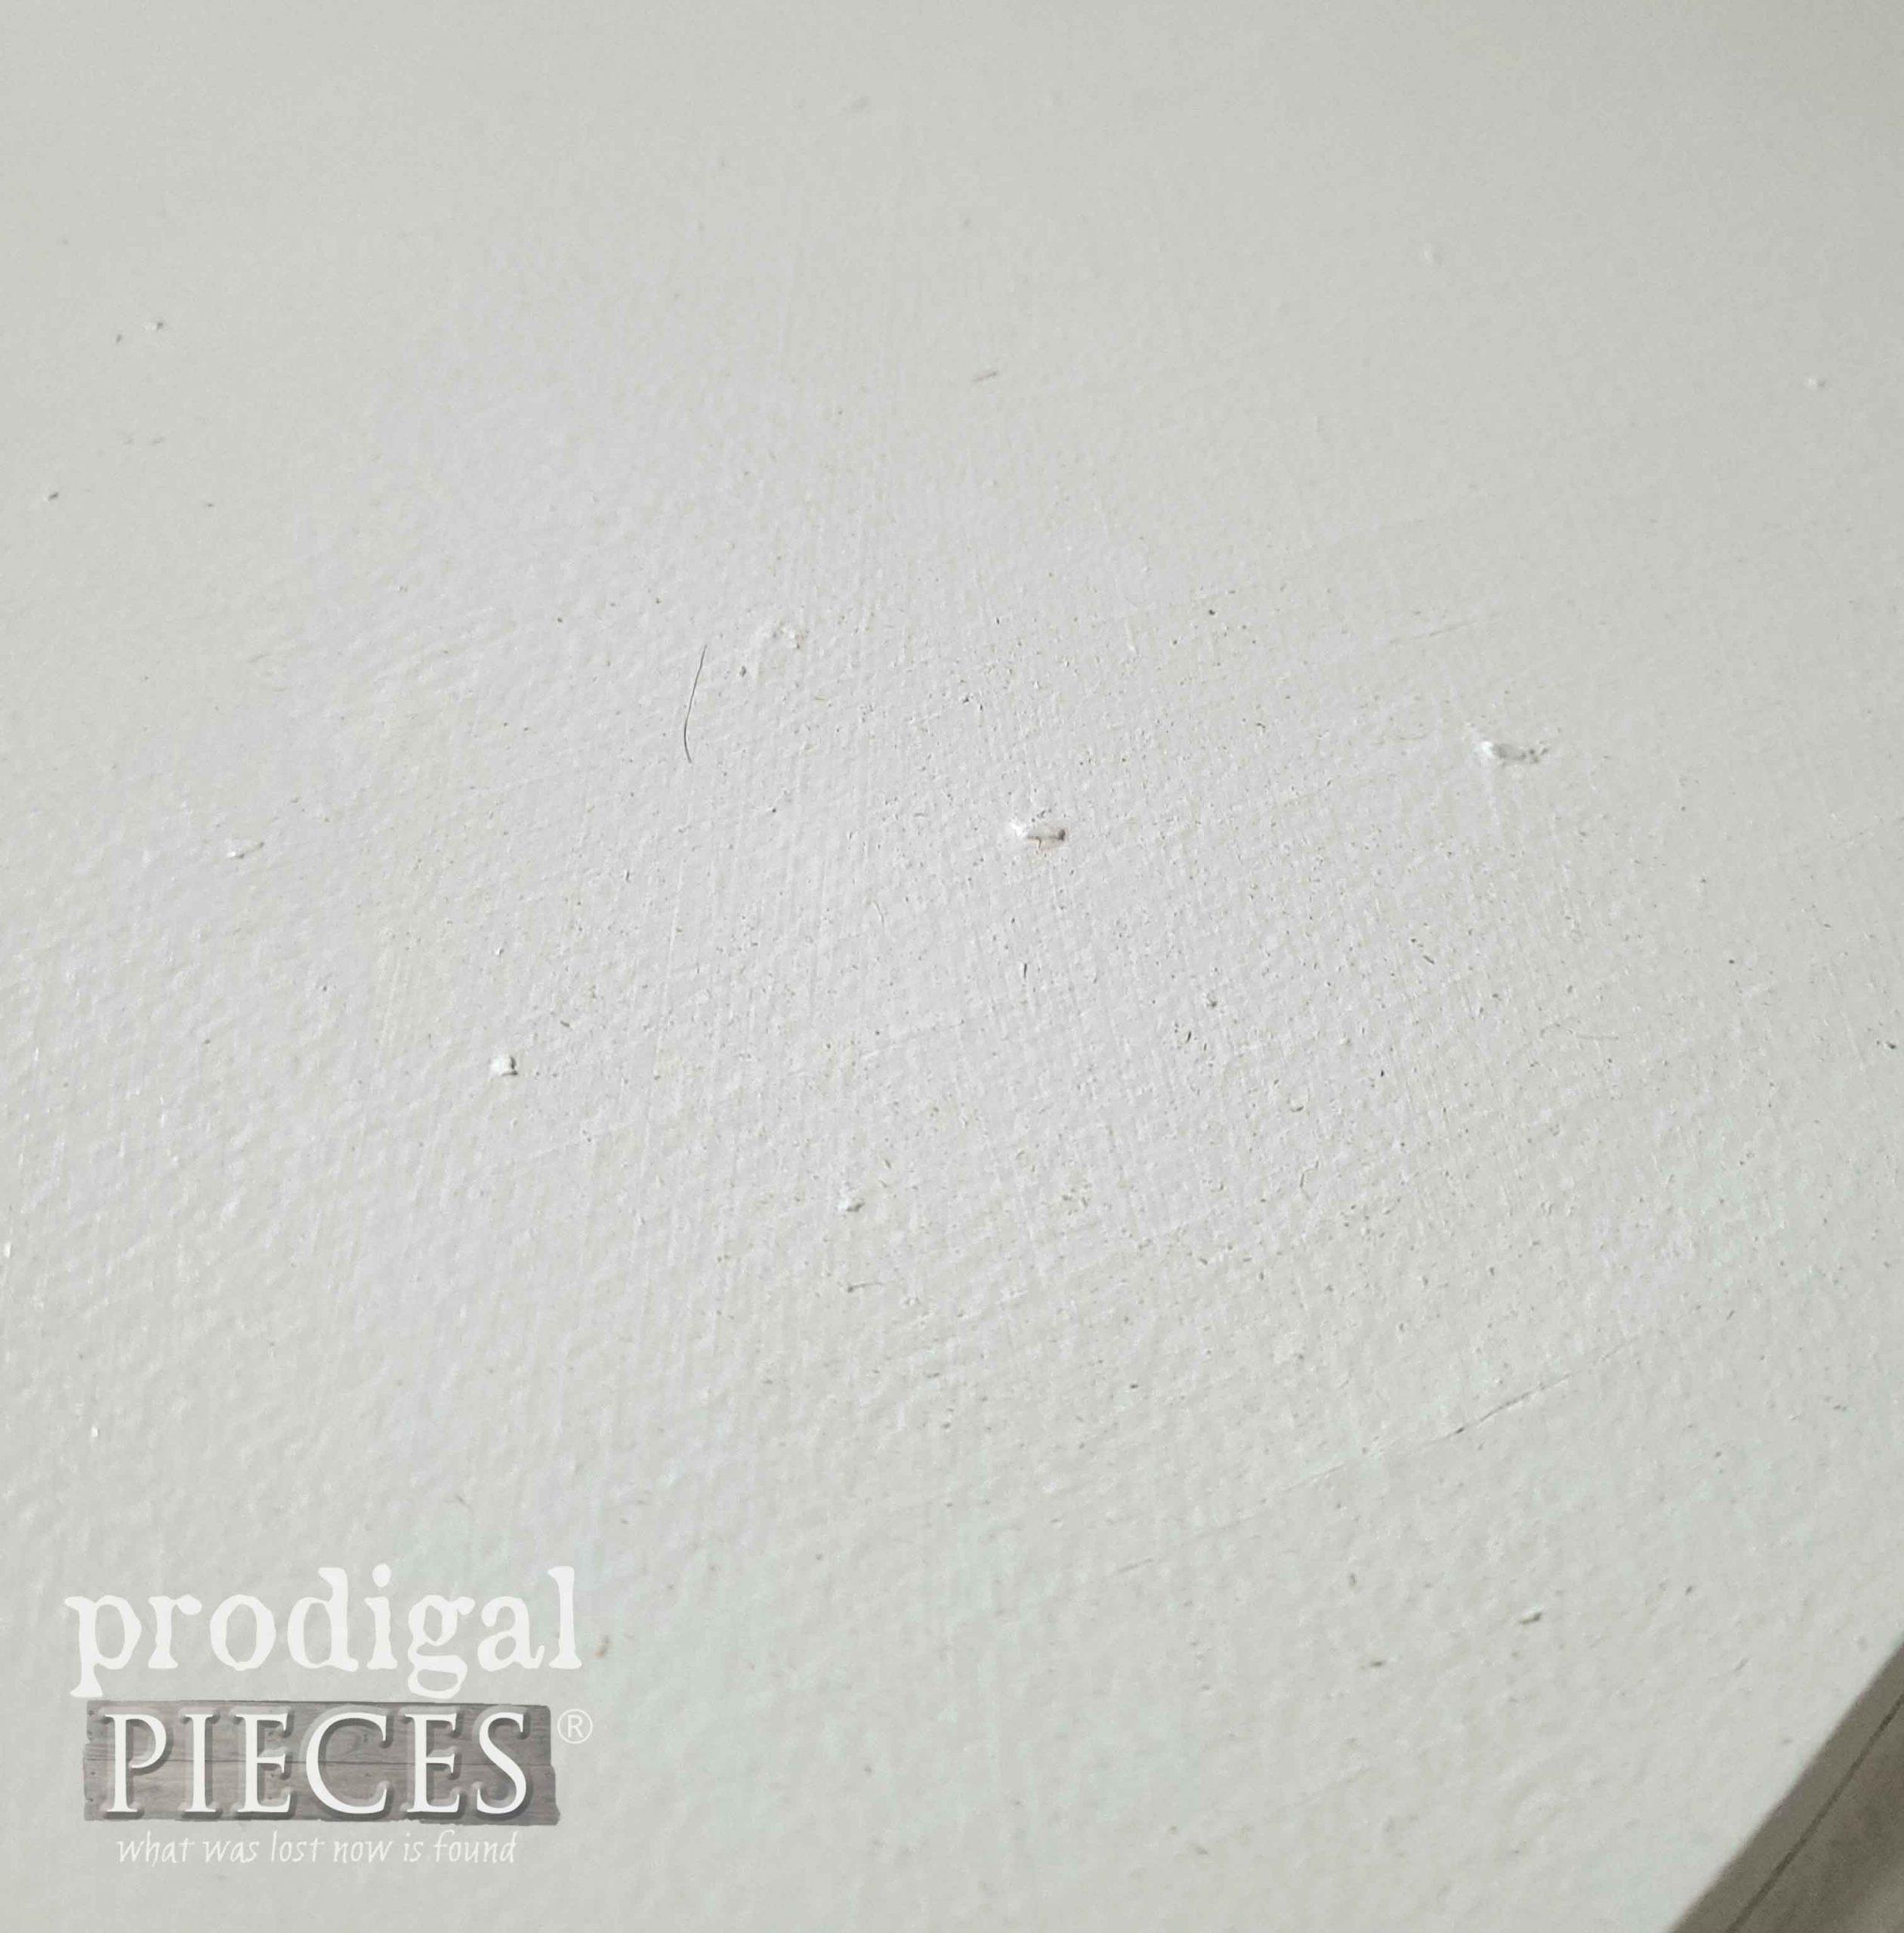 Bad Paint Job on Drum Table | prodigalpieces.com